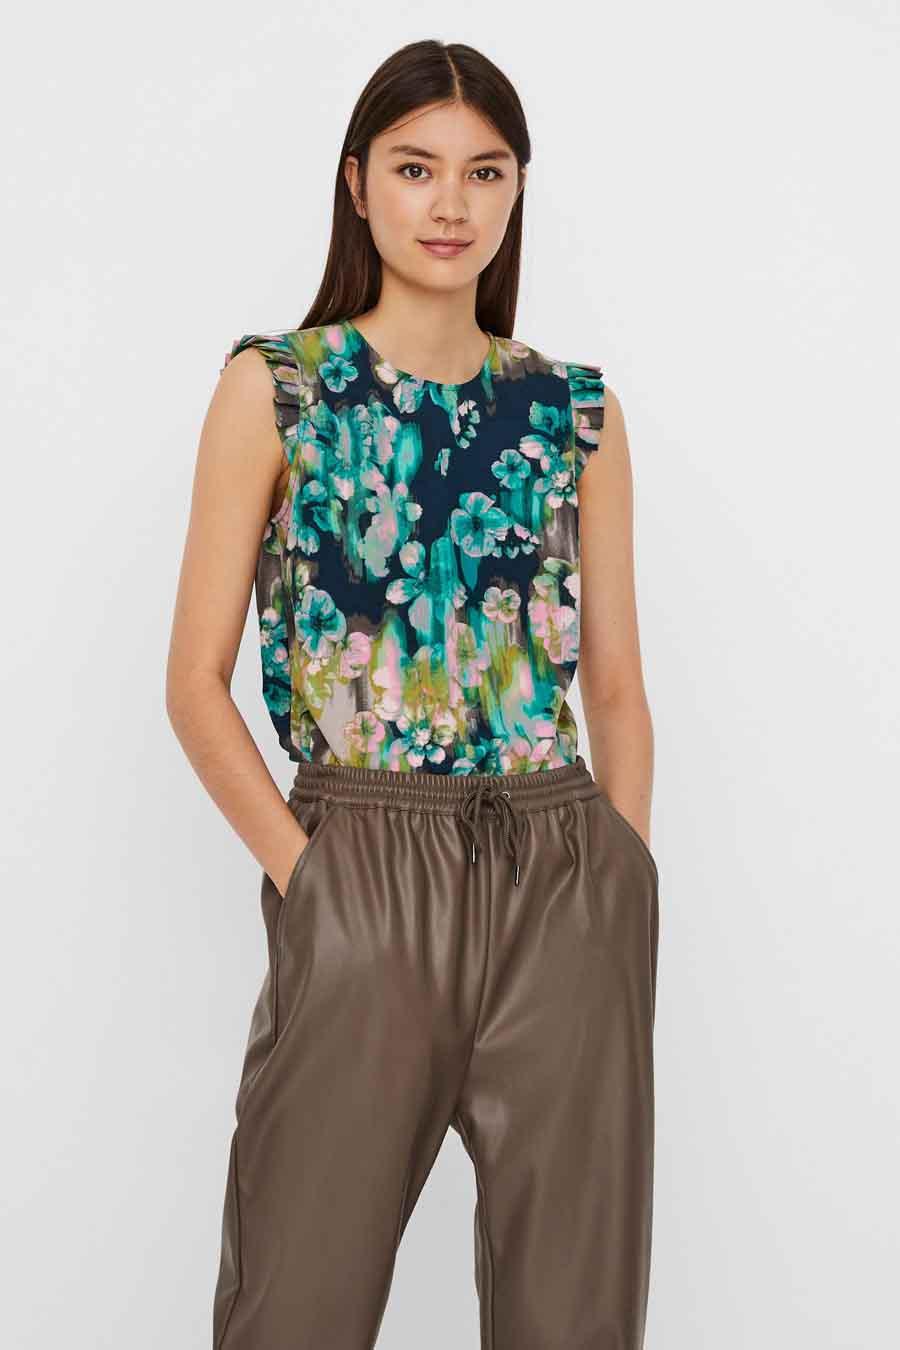 Vero Moda® Blouse zonder mouwen, Multicolor, Dames, Maat: M/XS